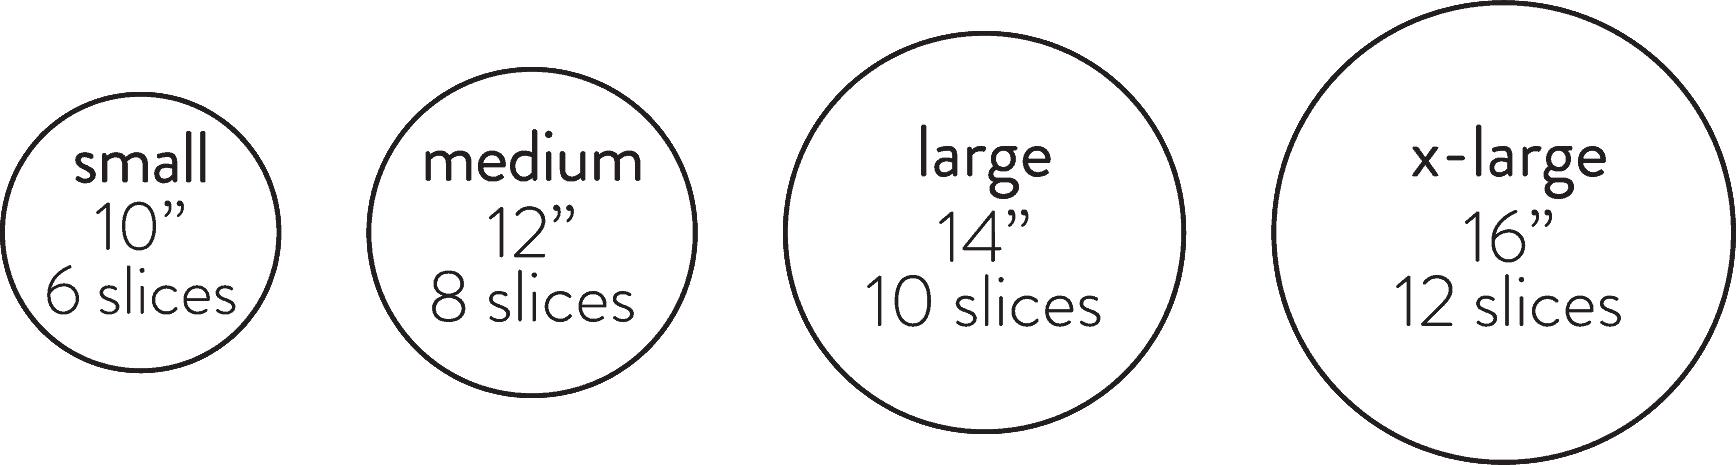 pizza n such logo